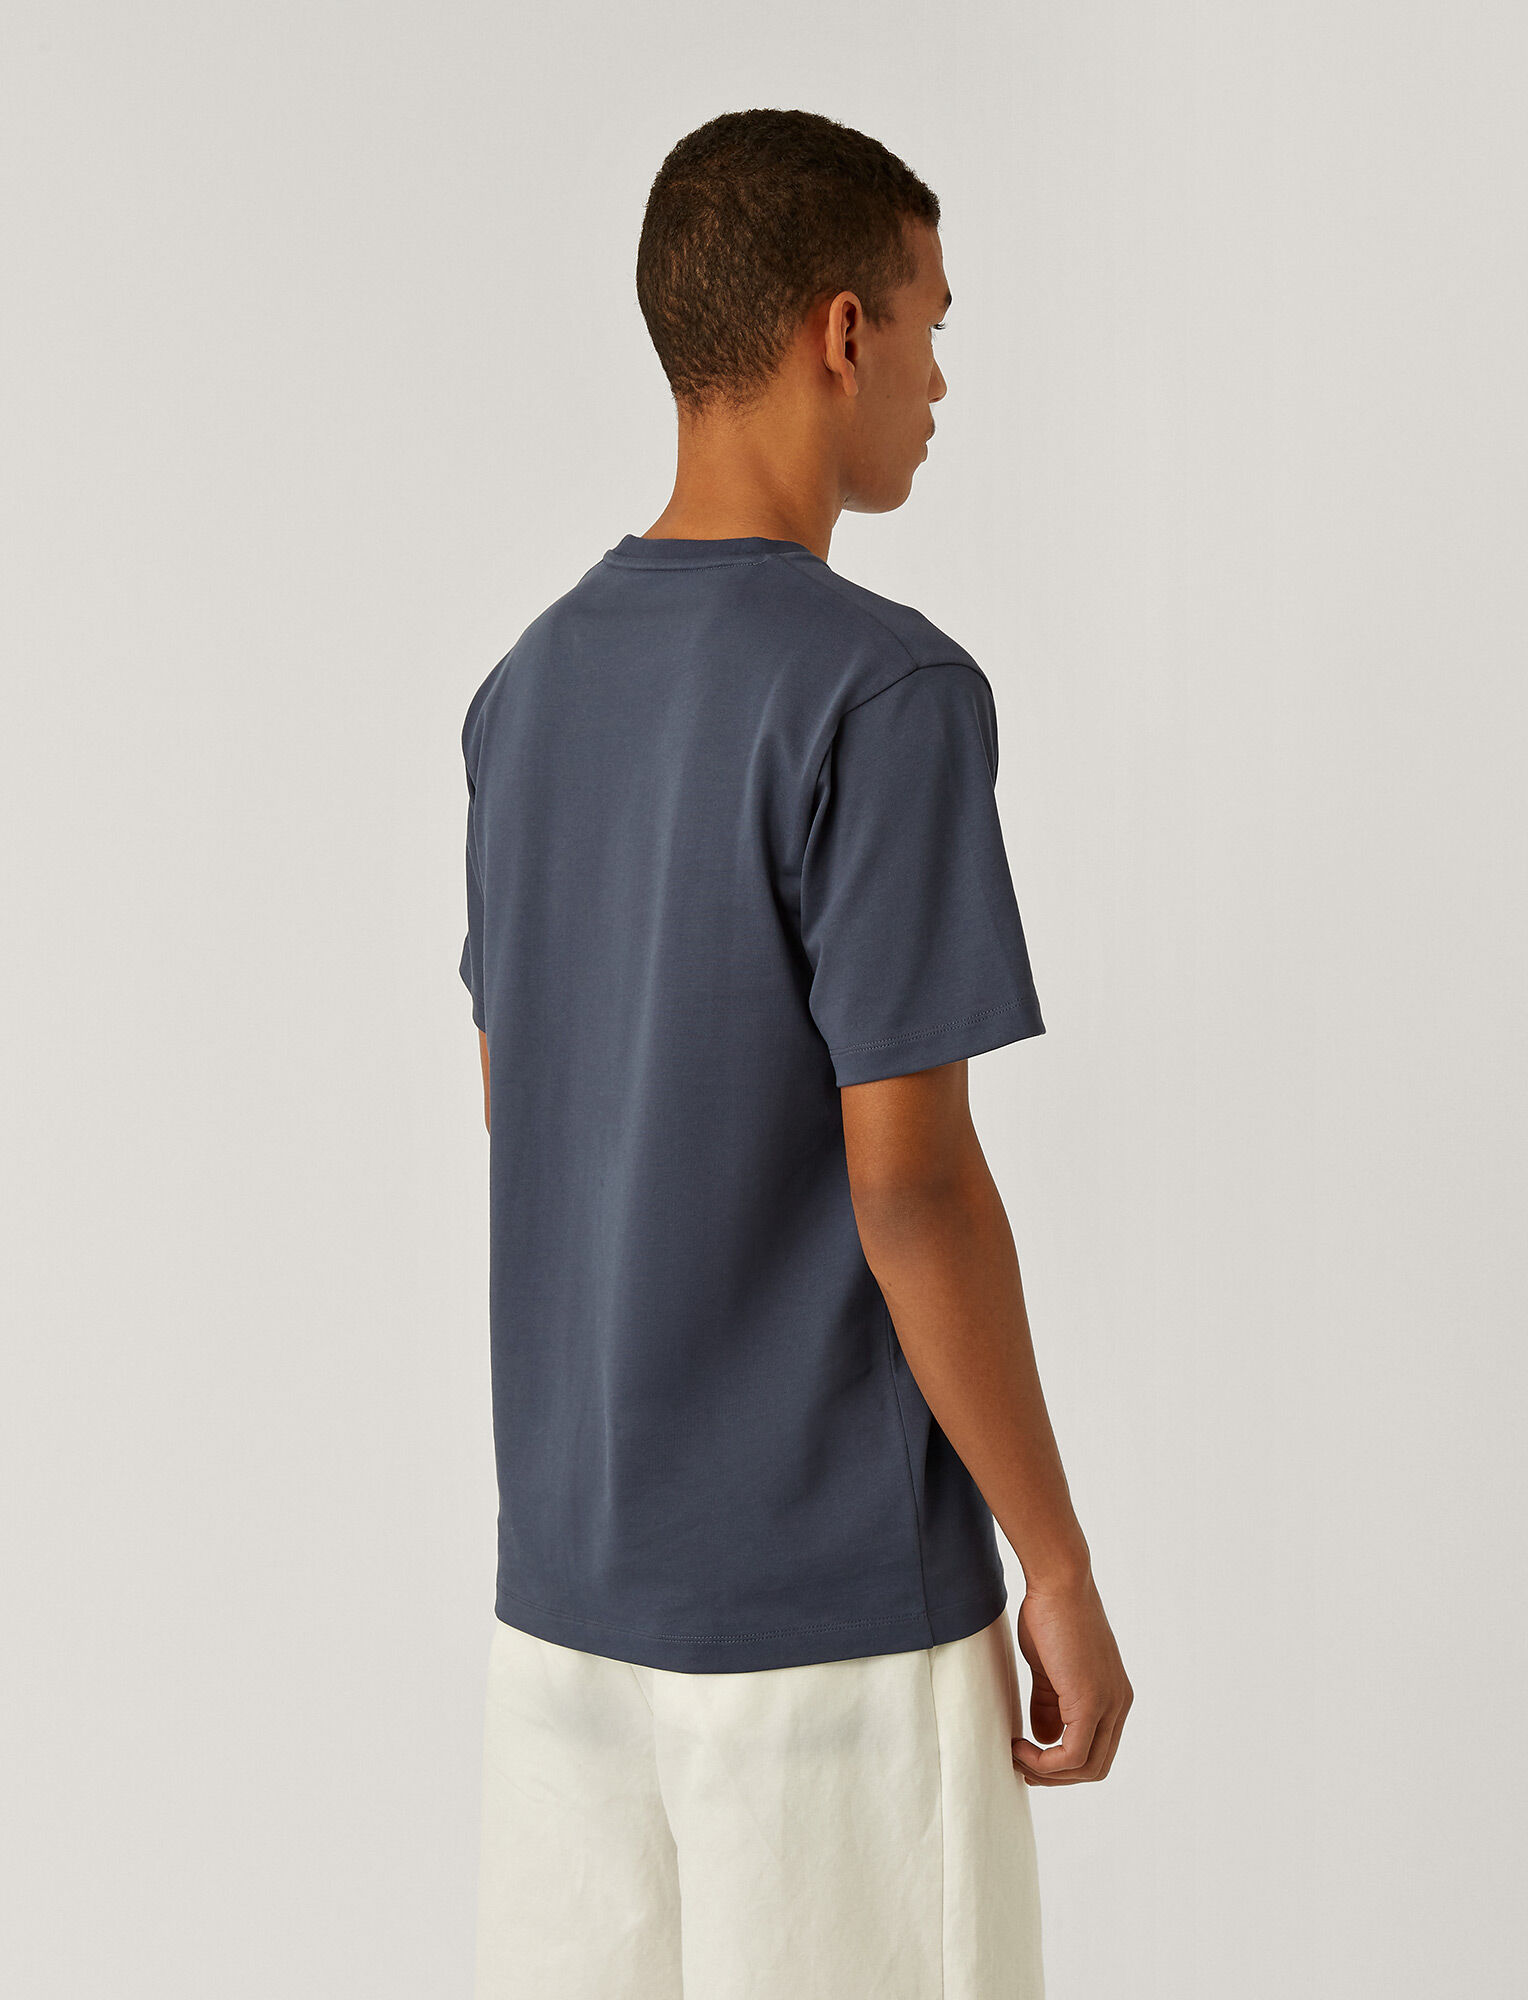 Joseph, Soft Organic Jersey T Shirt, in BLUE STEEL